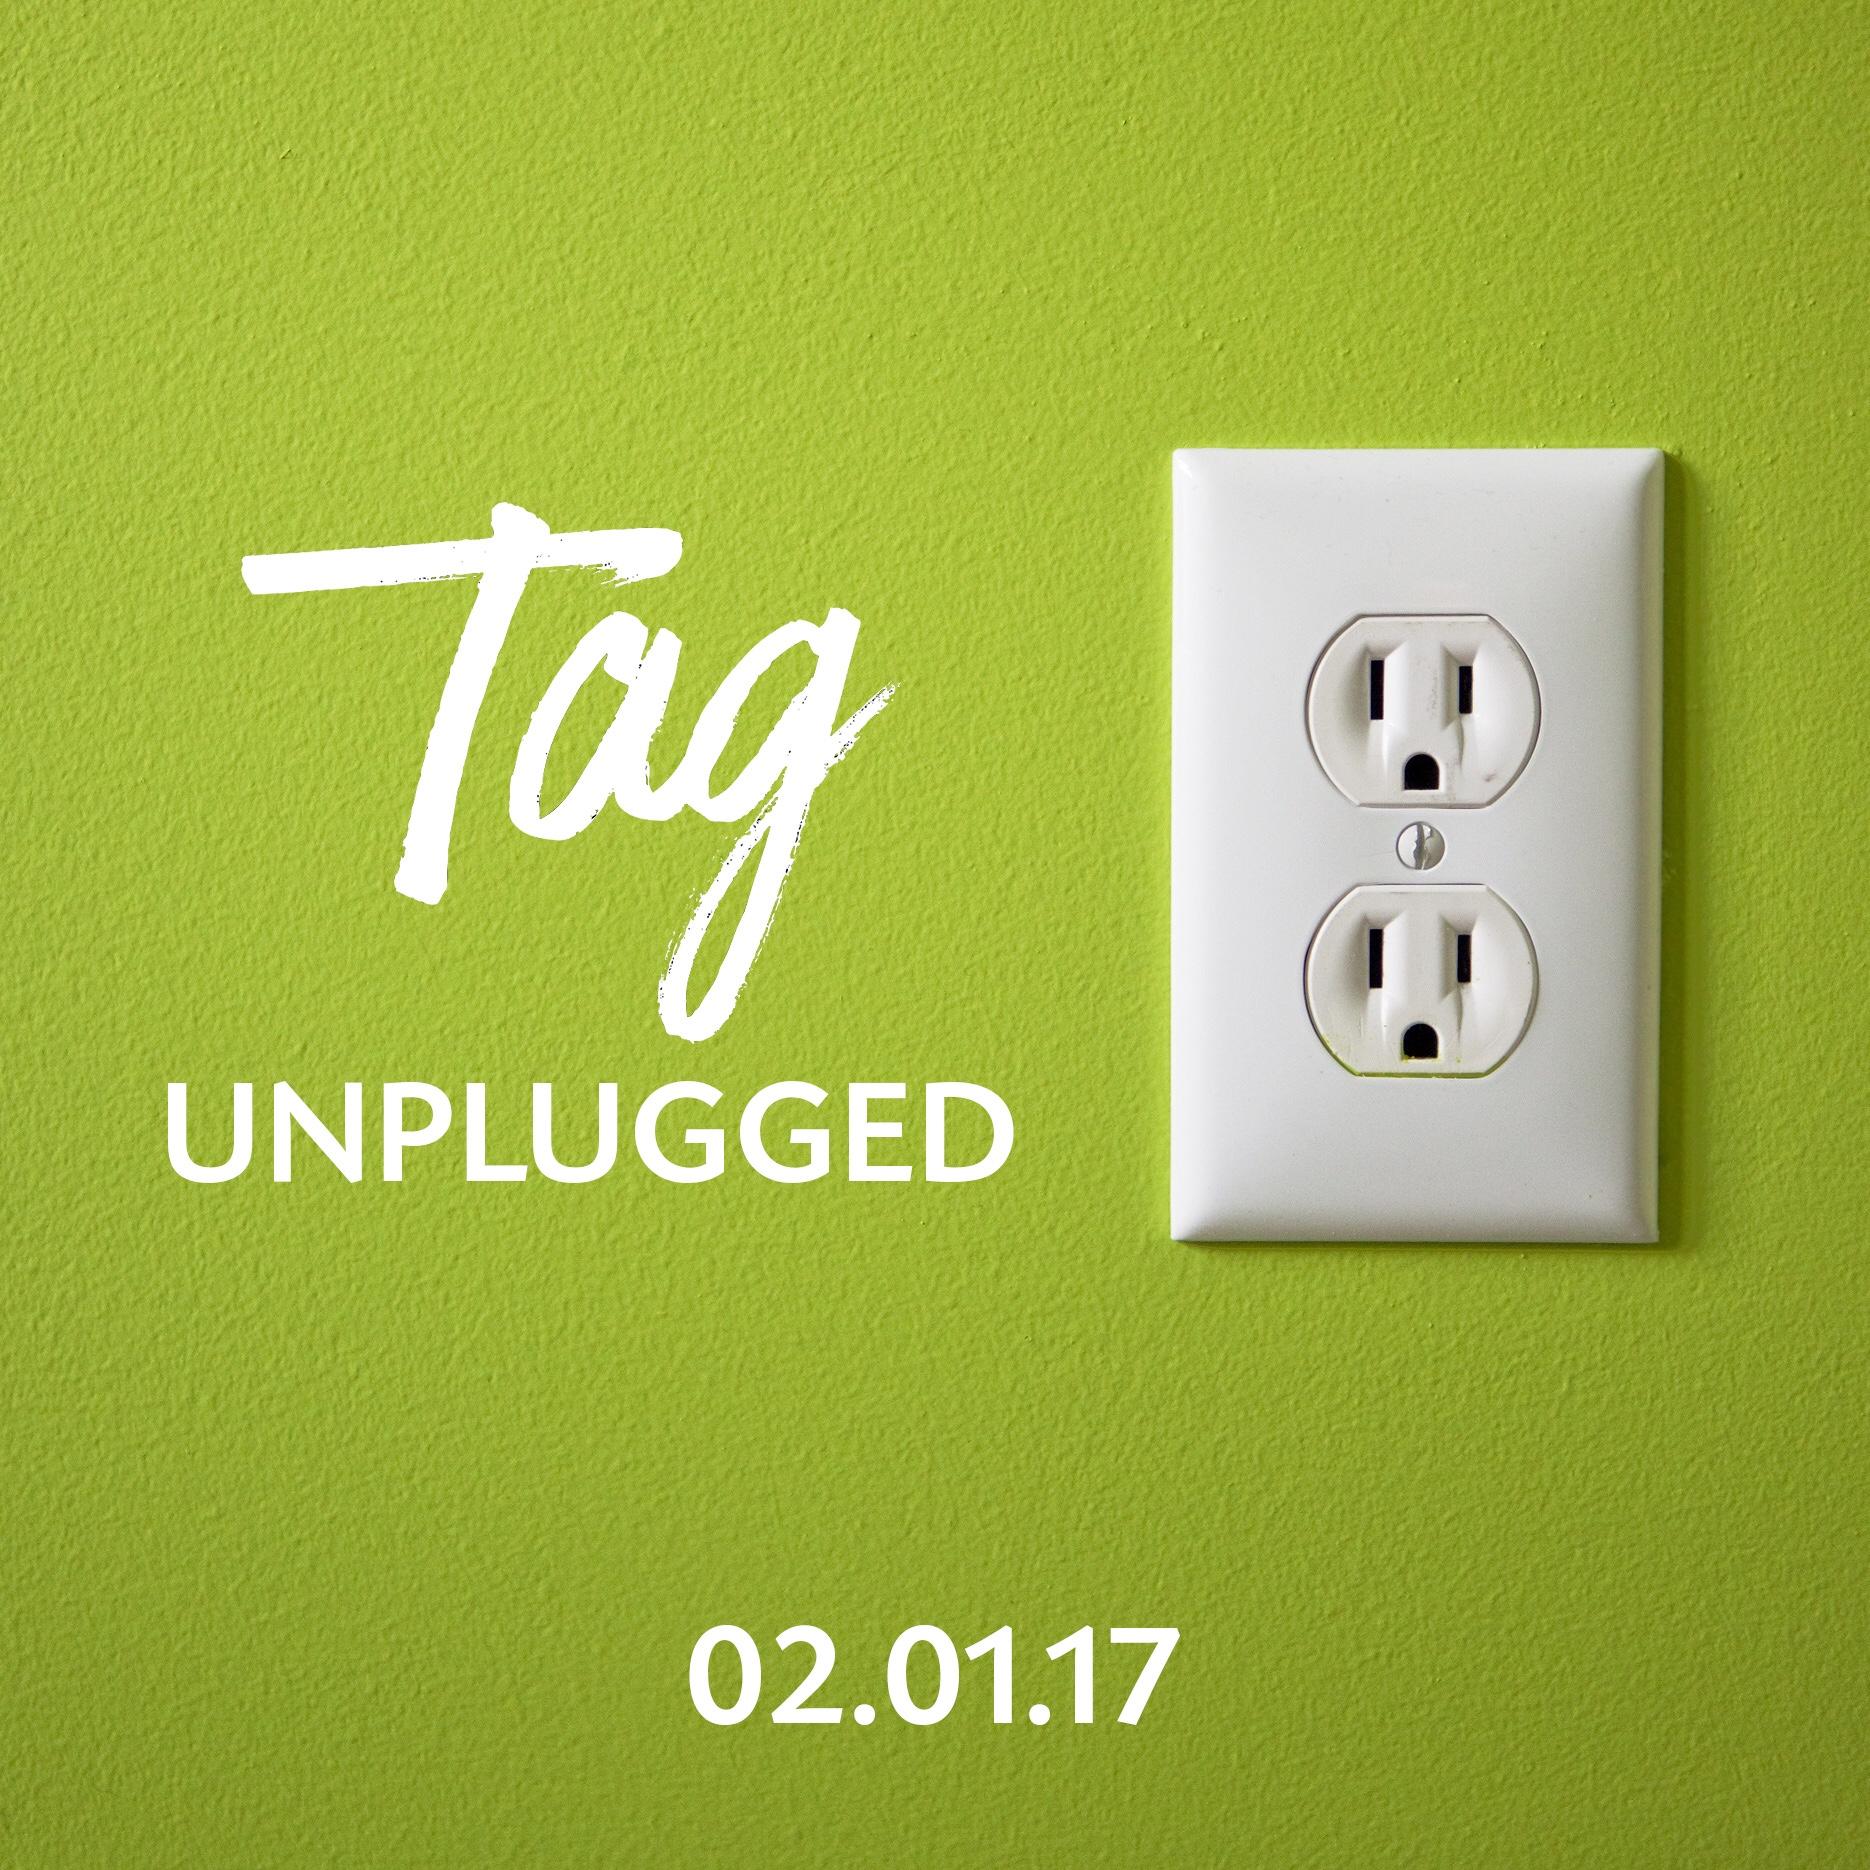 Tag_unplugged